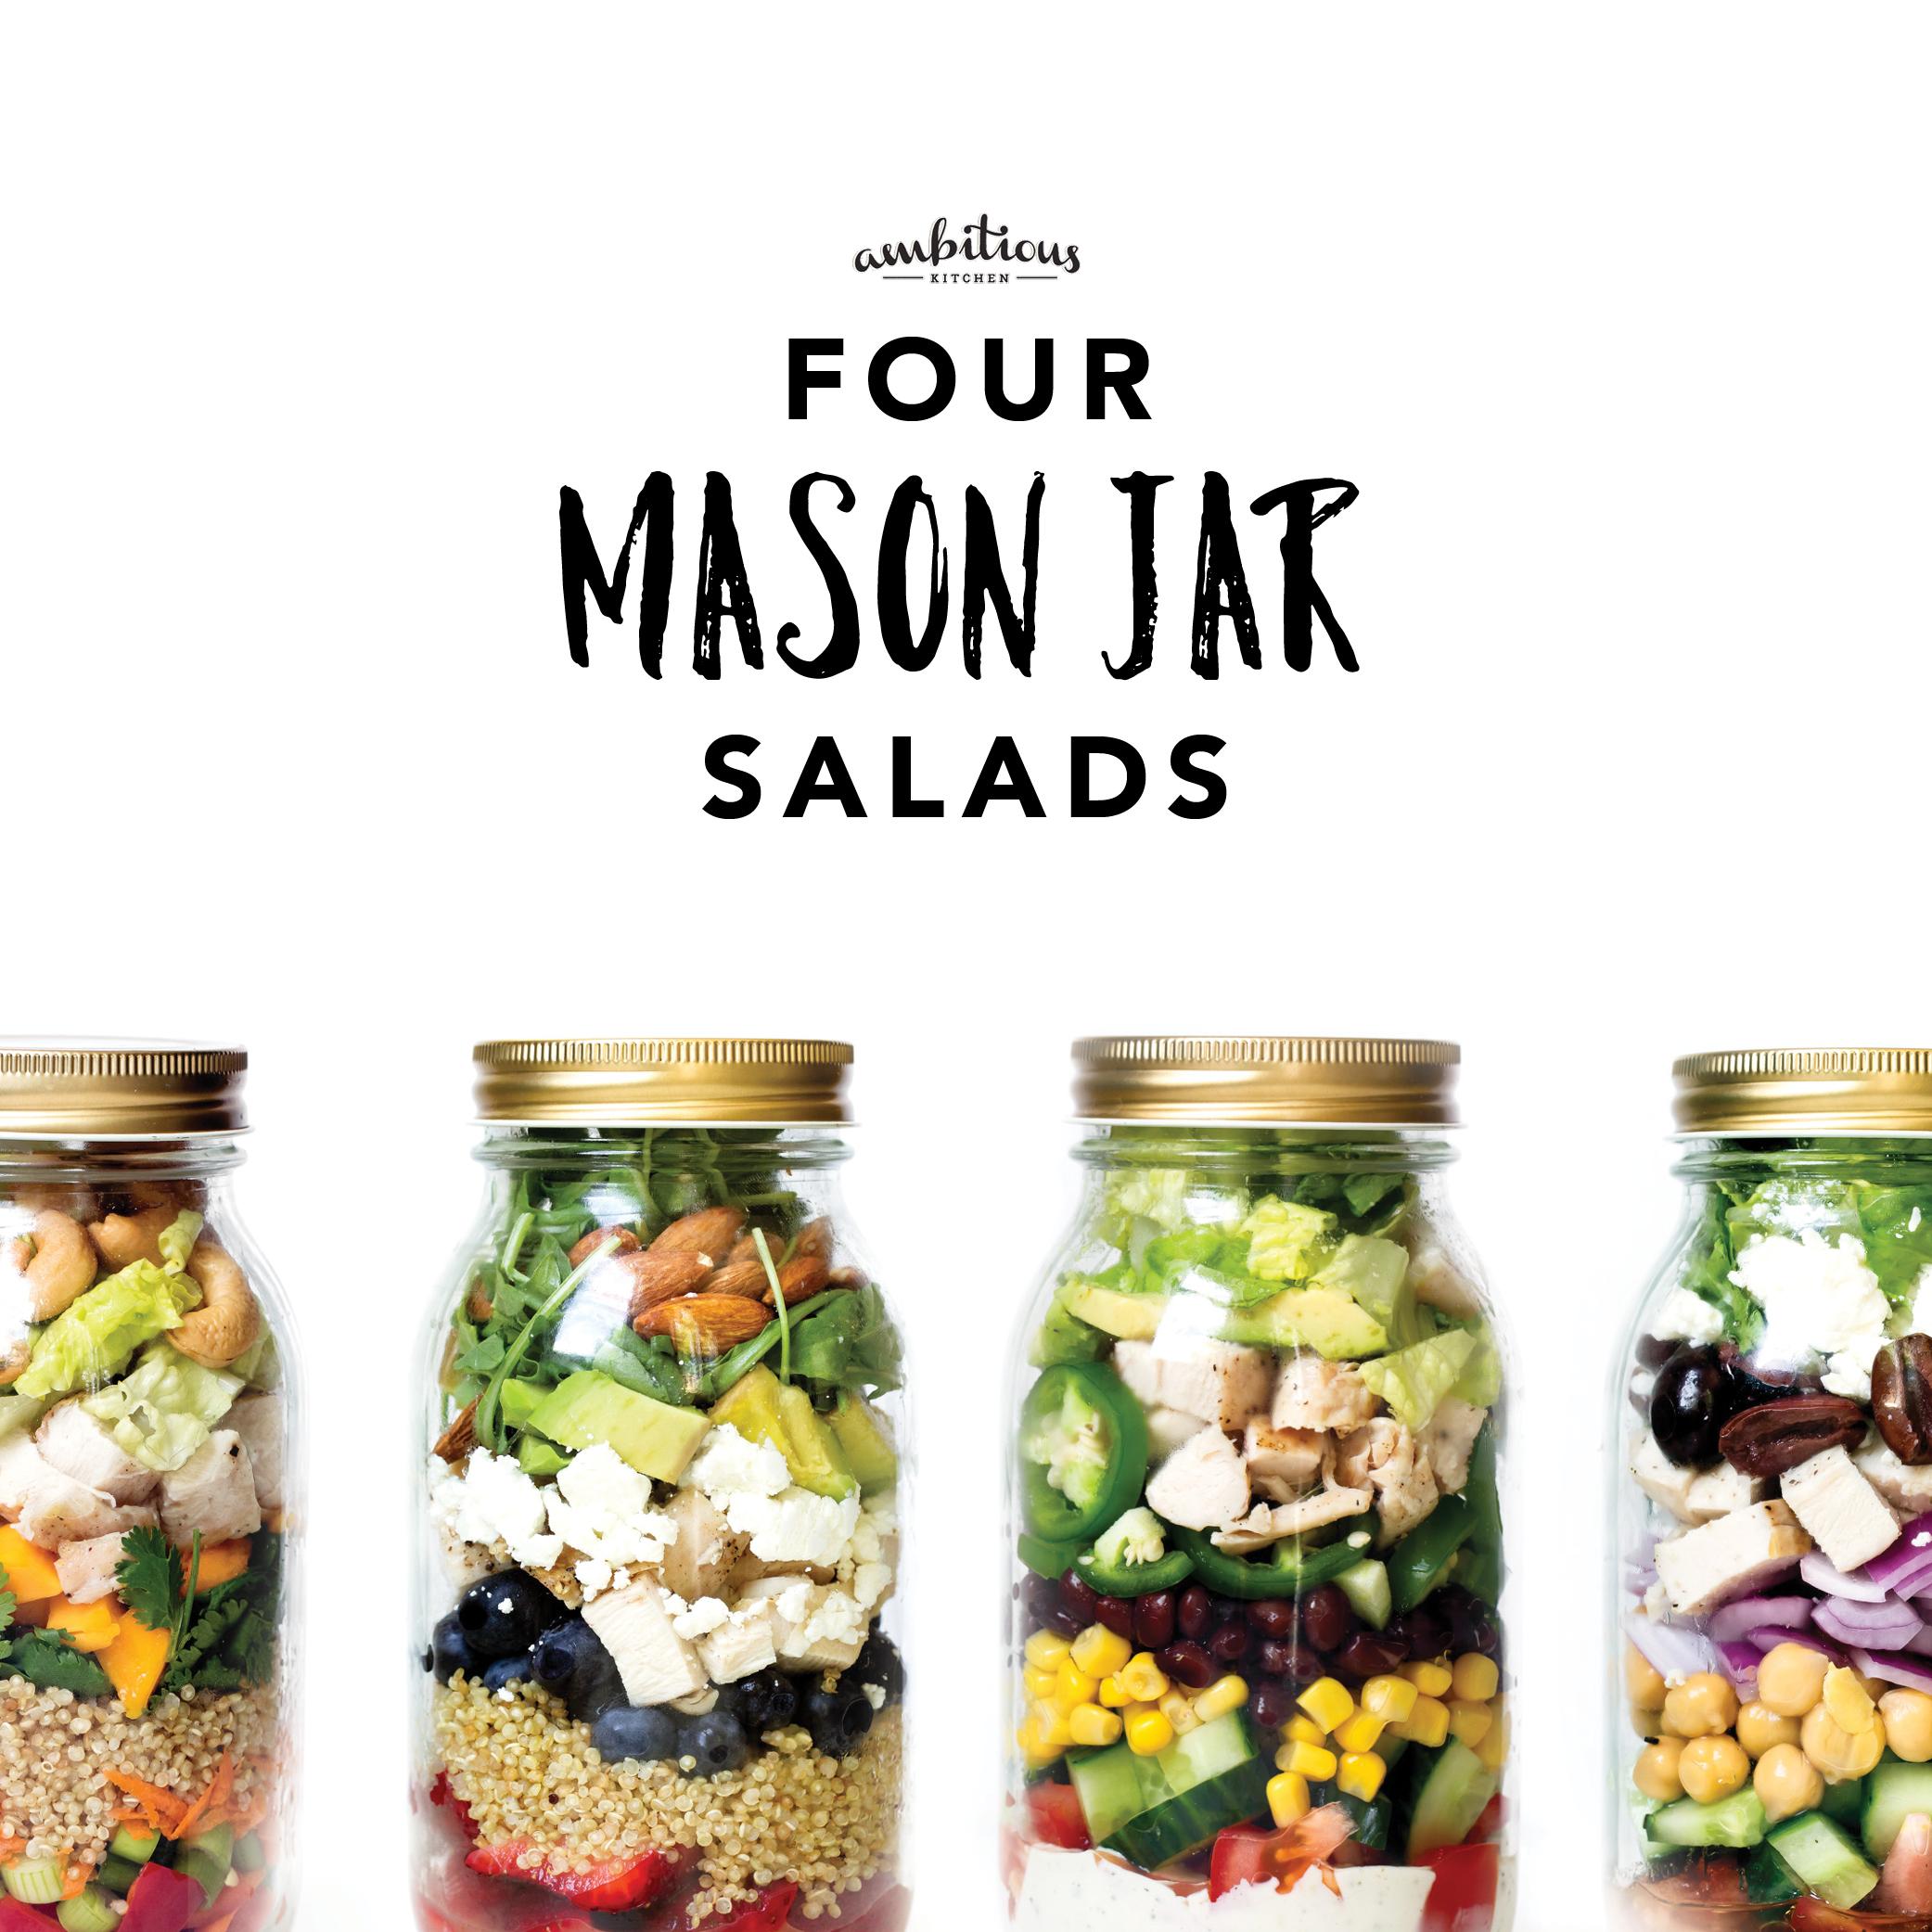 Four Mason Jar Salads